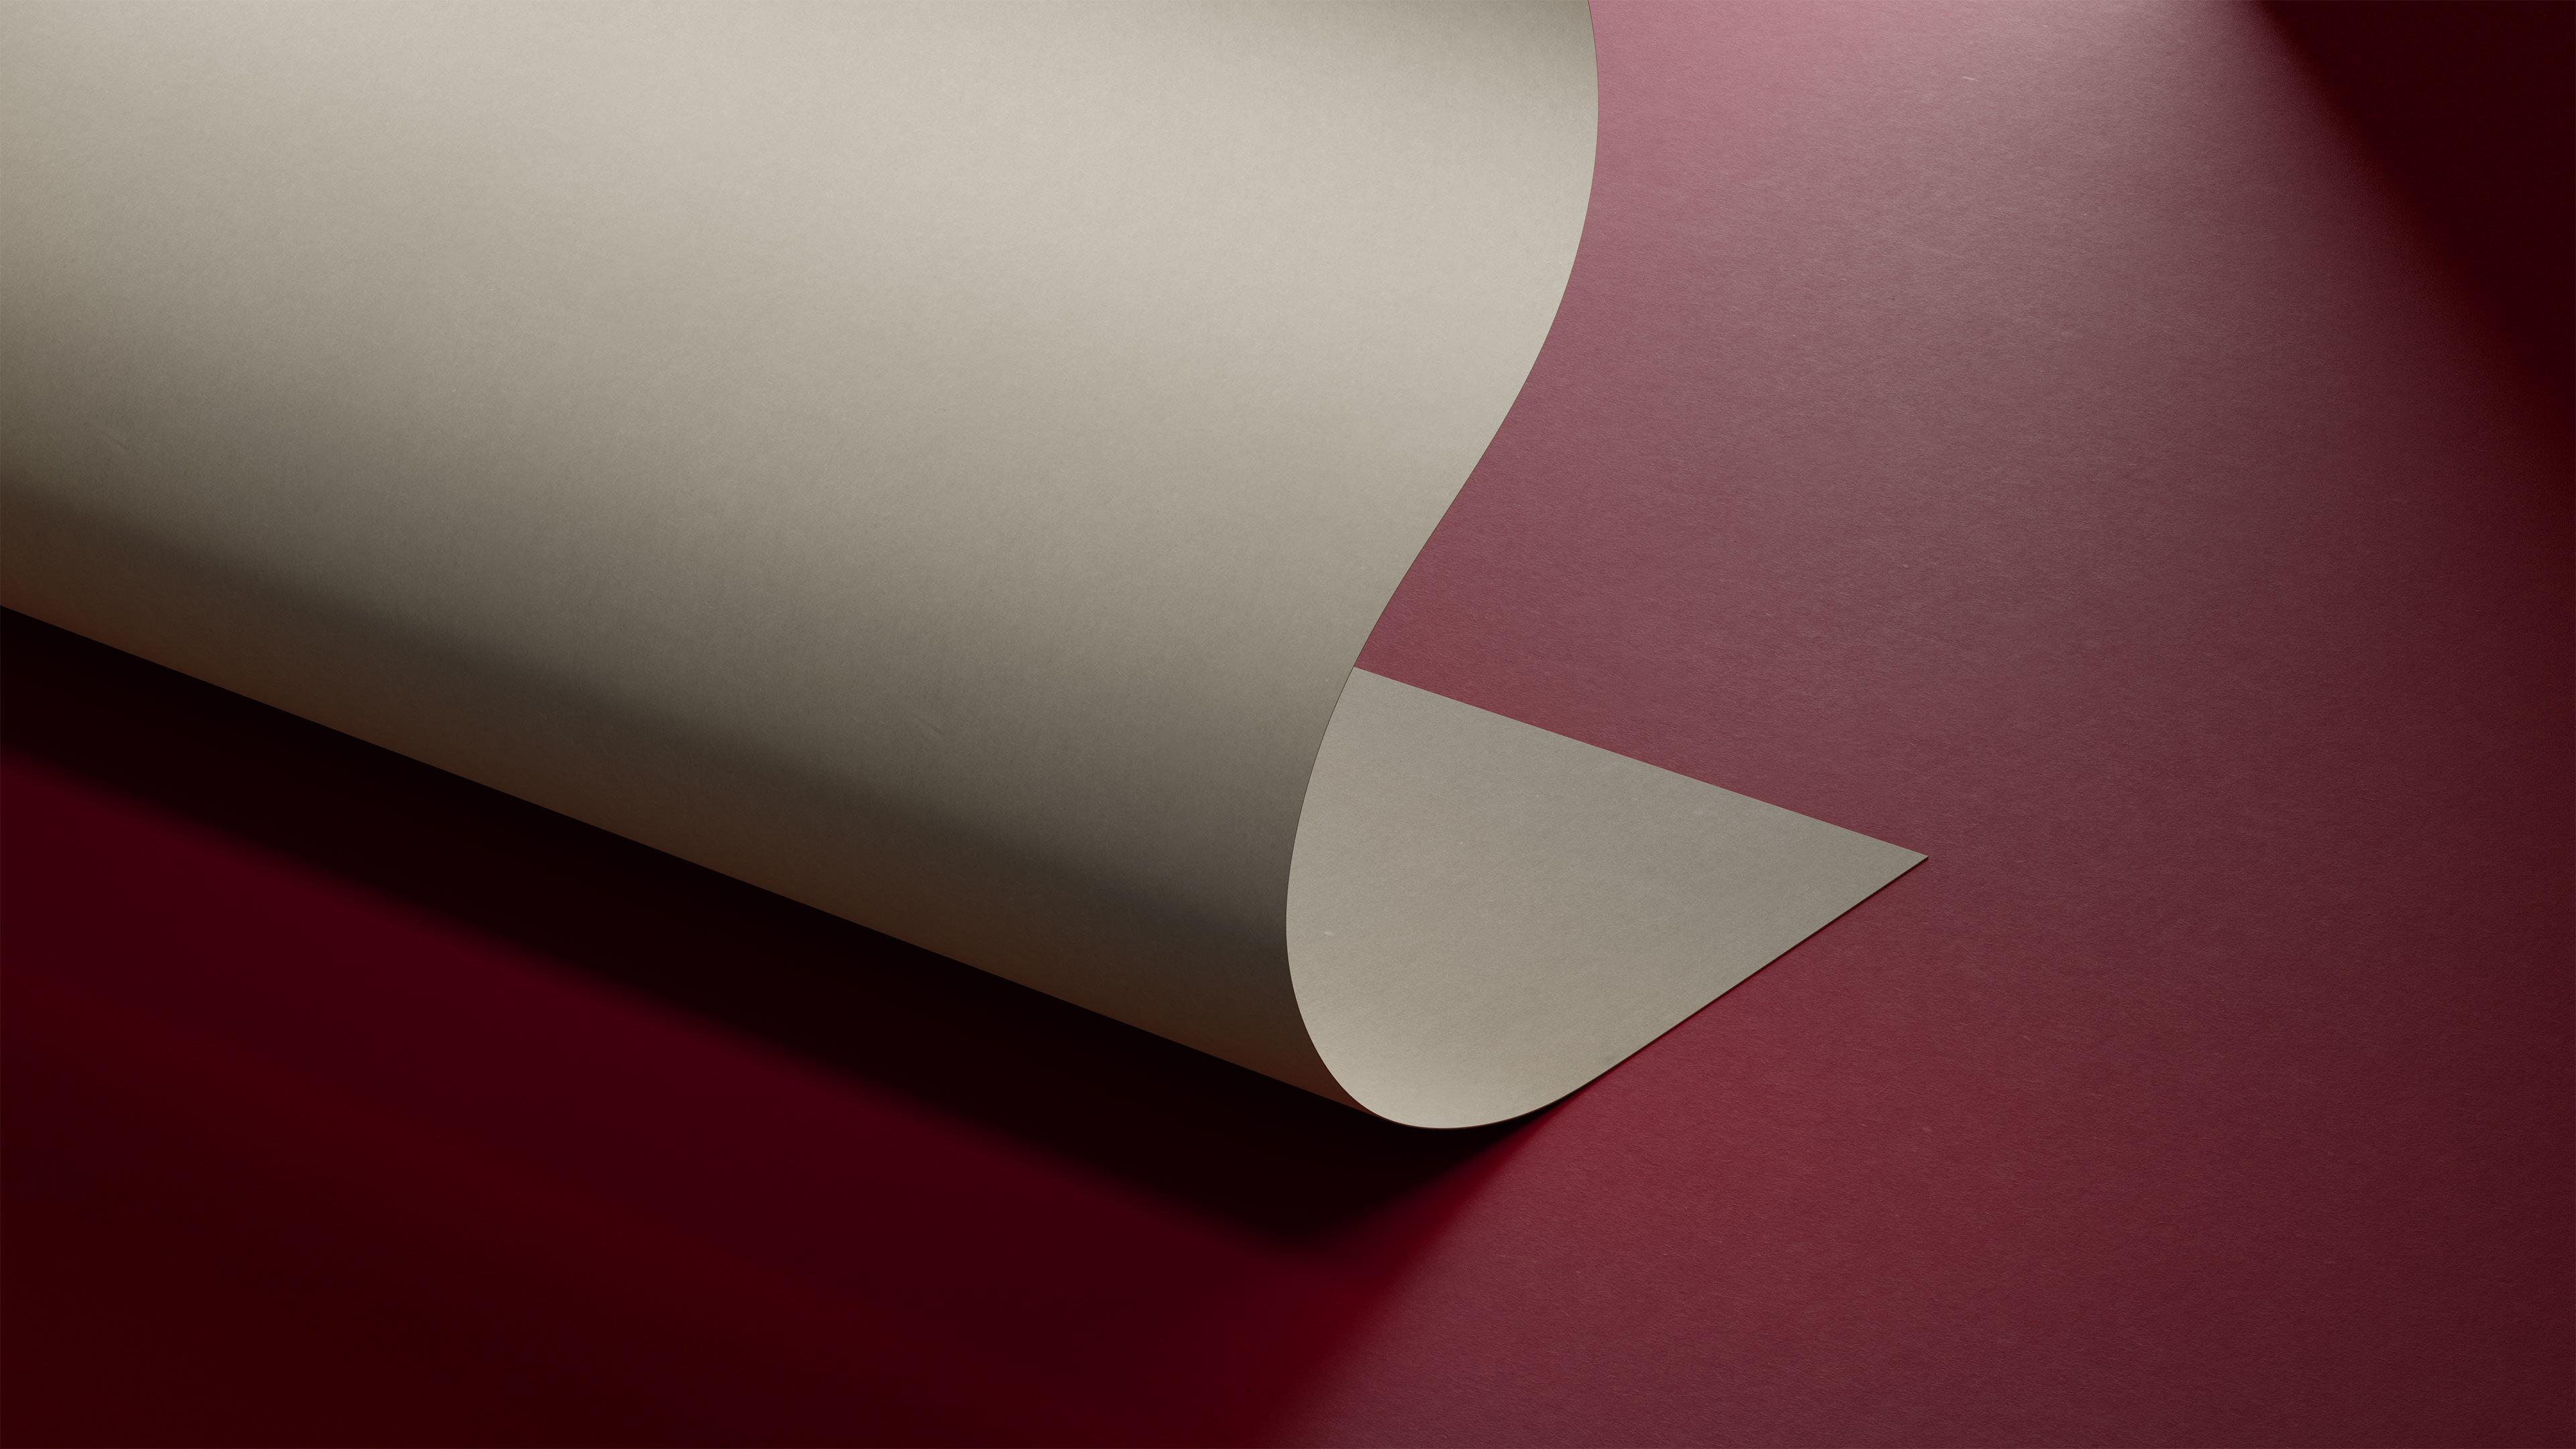 Landscape debrauw paper burgundy duo high res 2